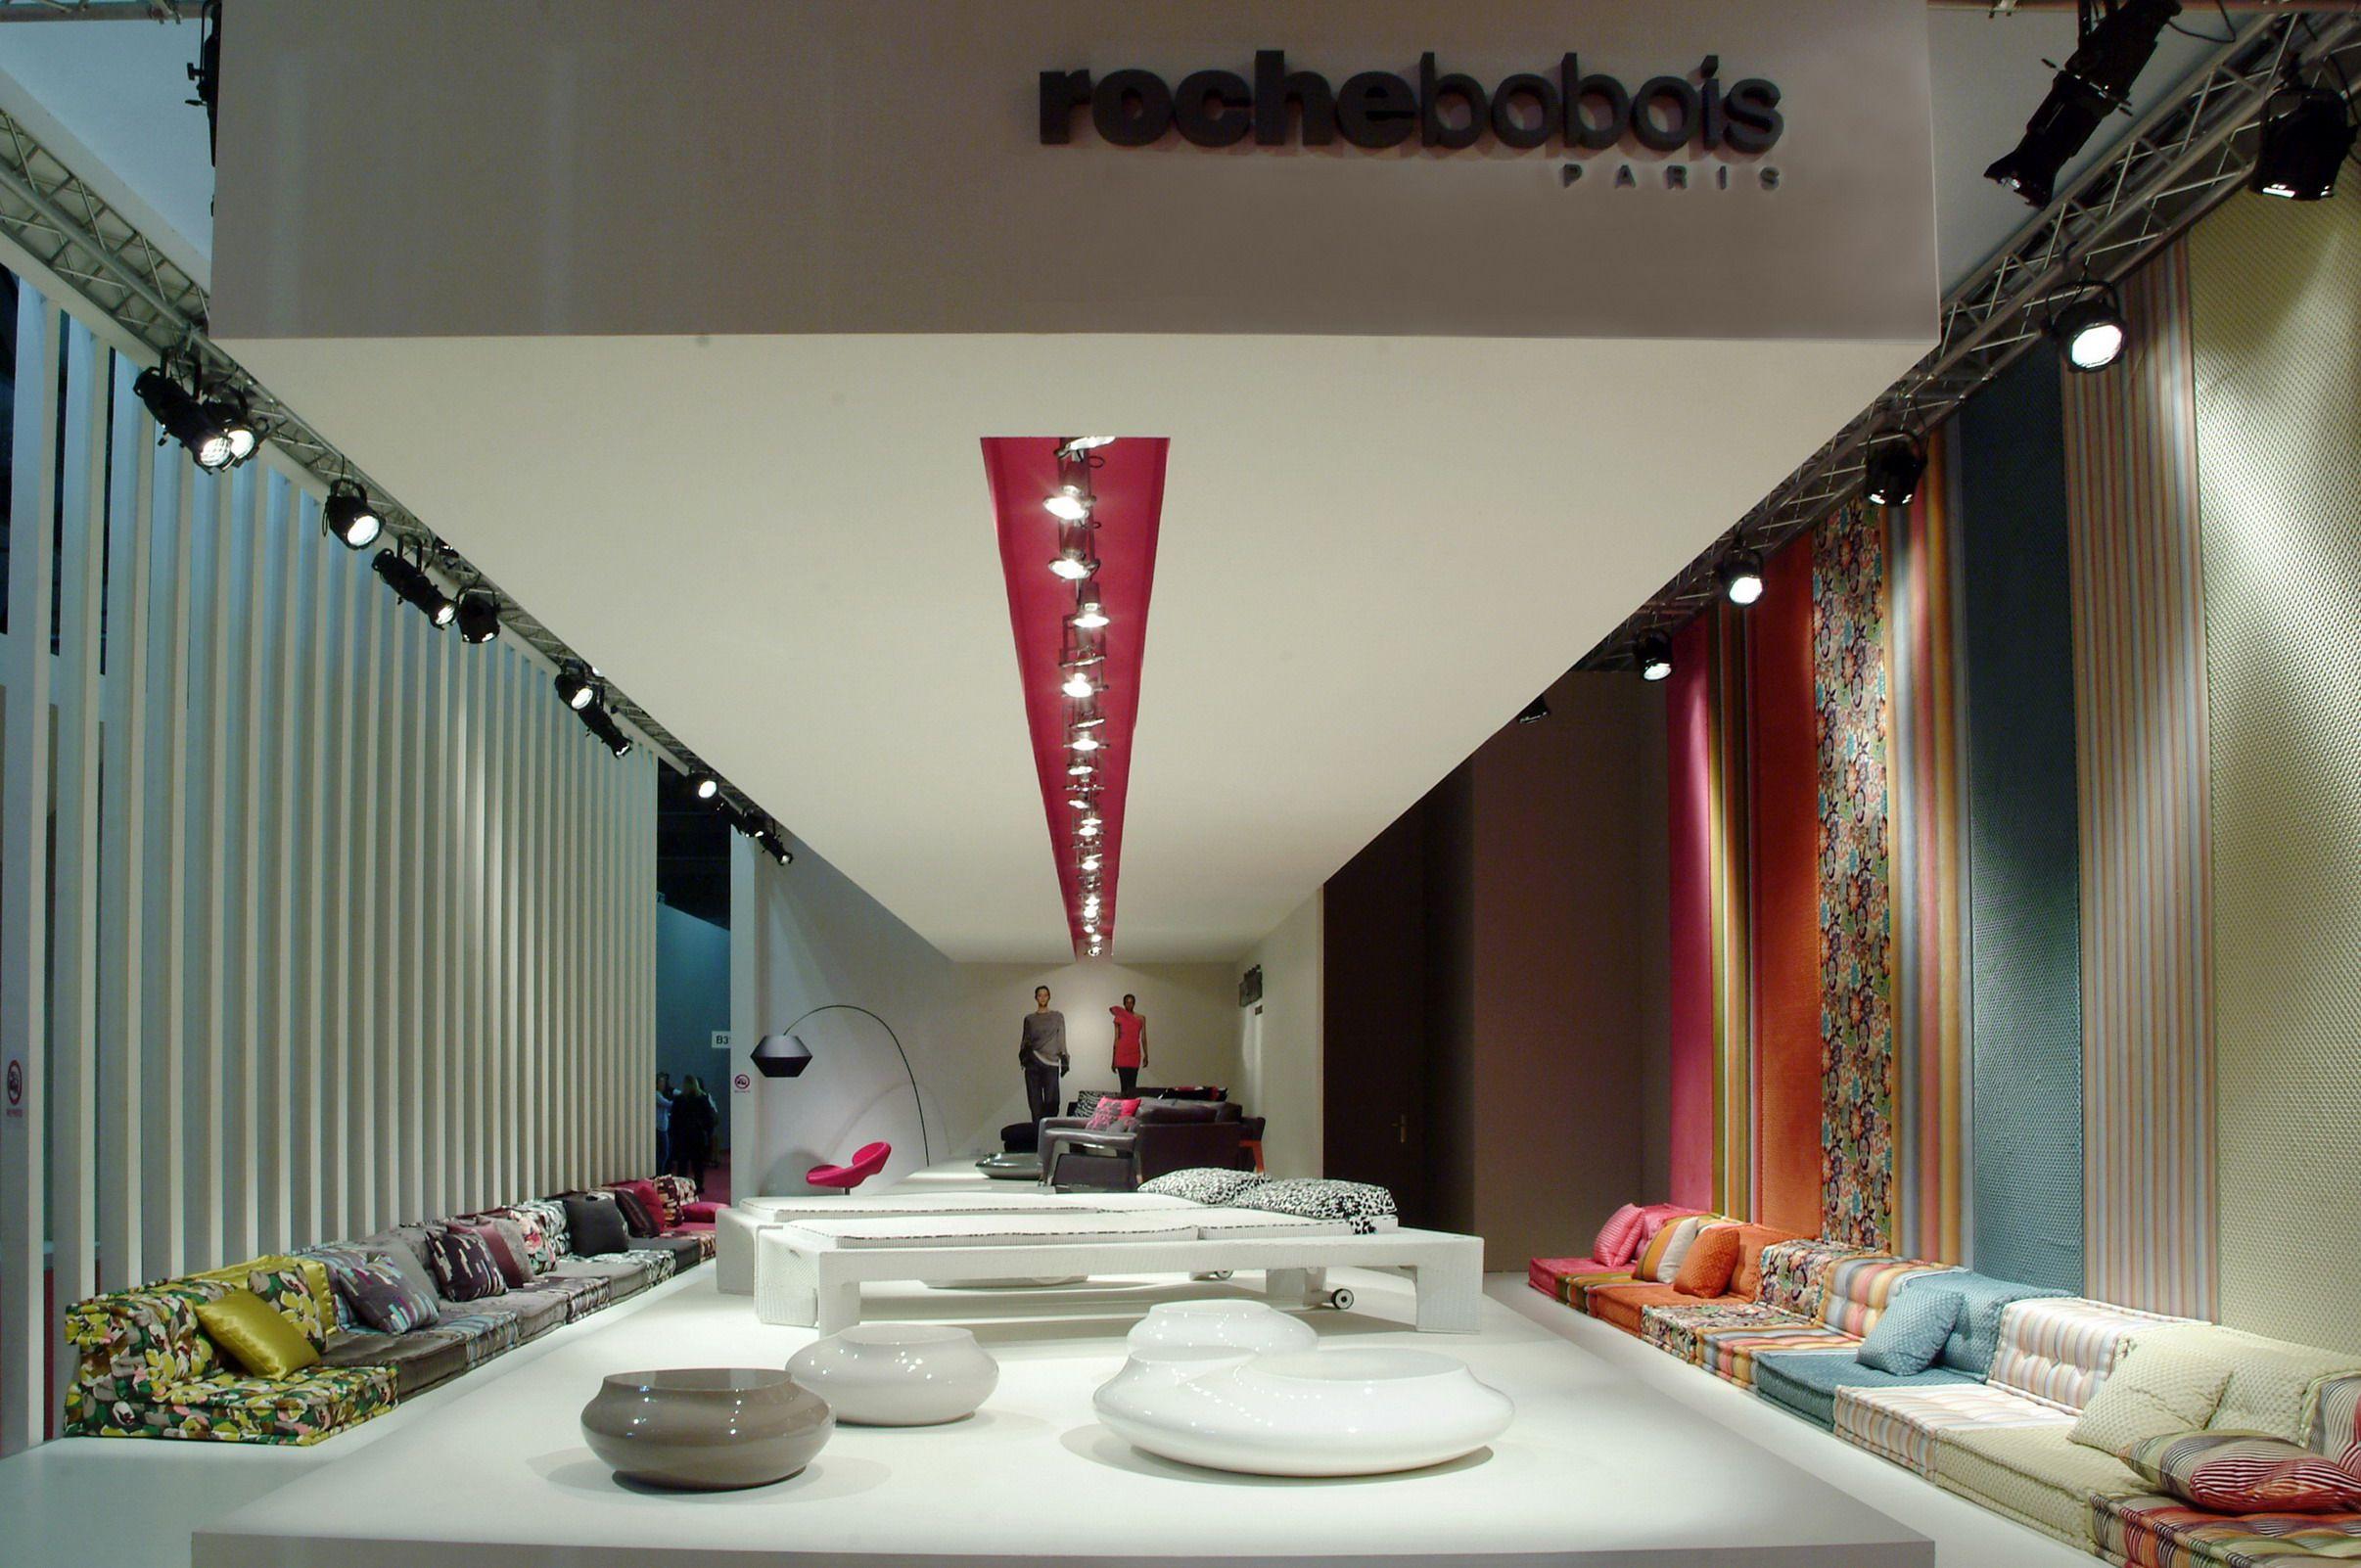 Roche Bobois stand at the Milan furniture fair 2009